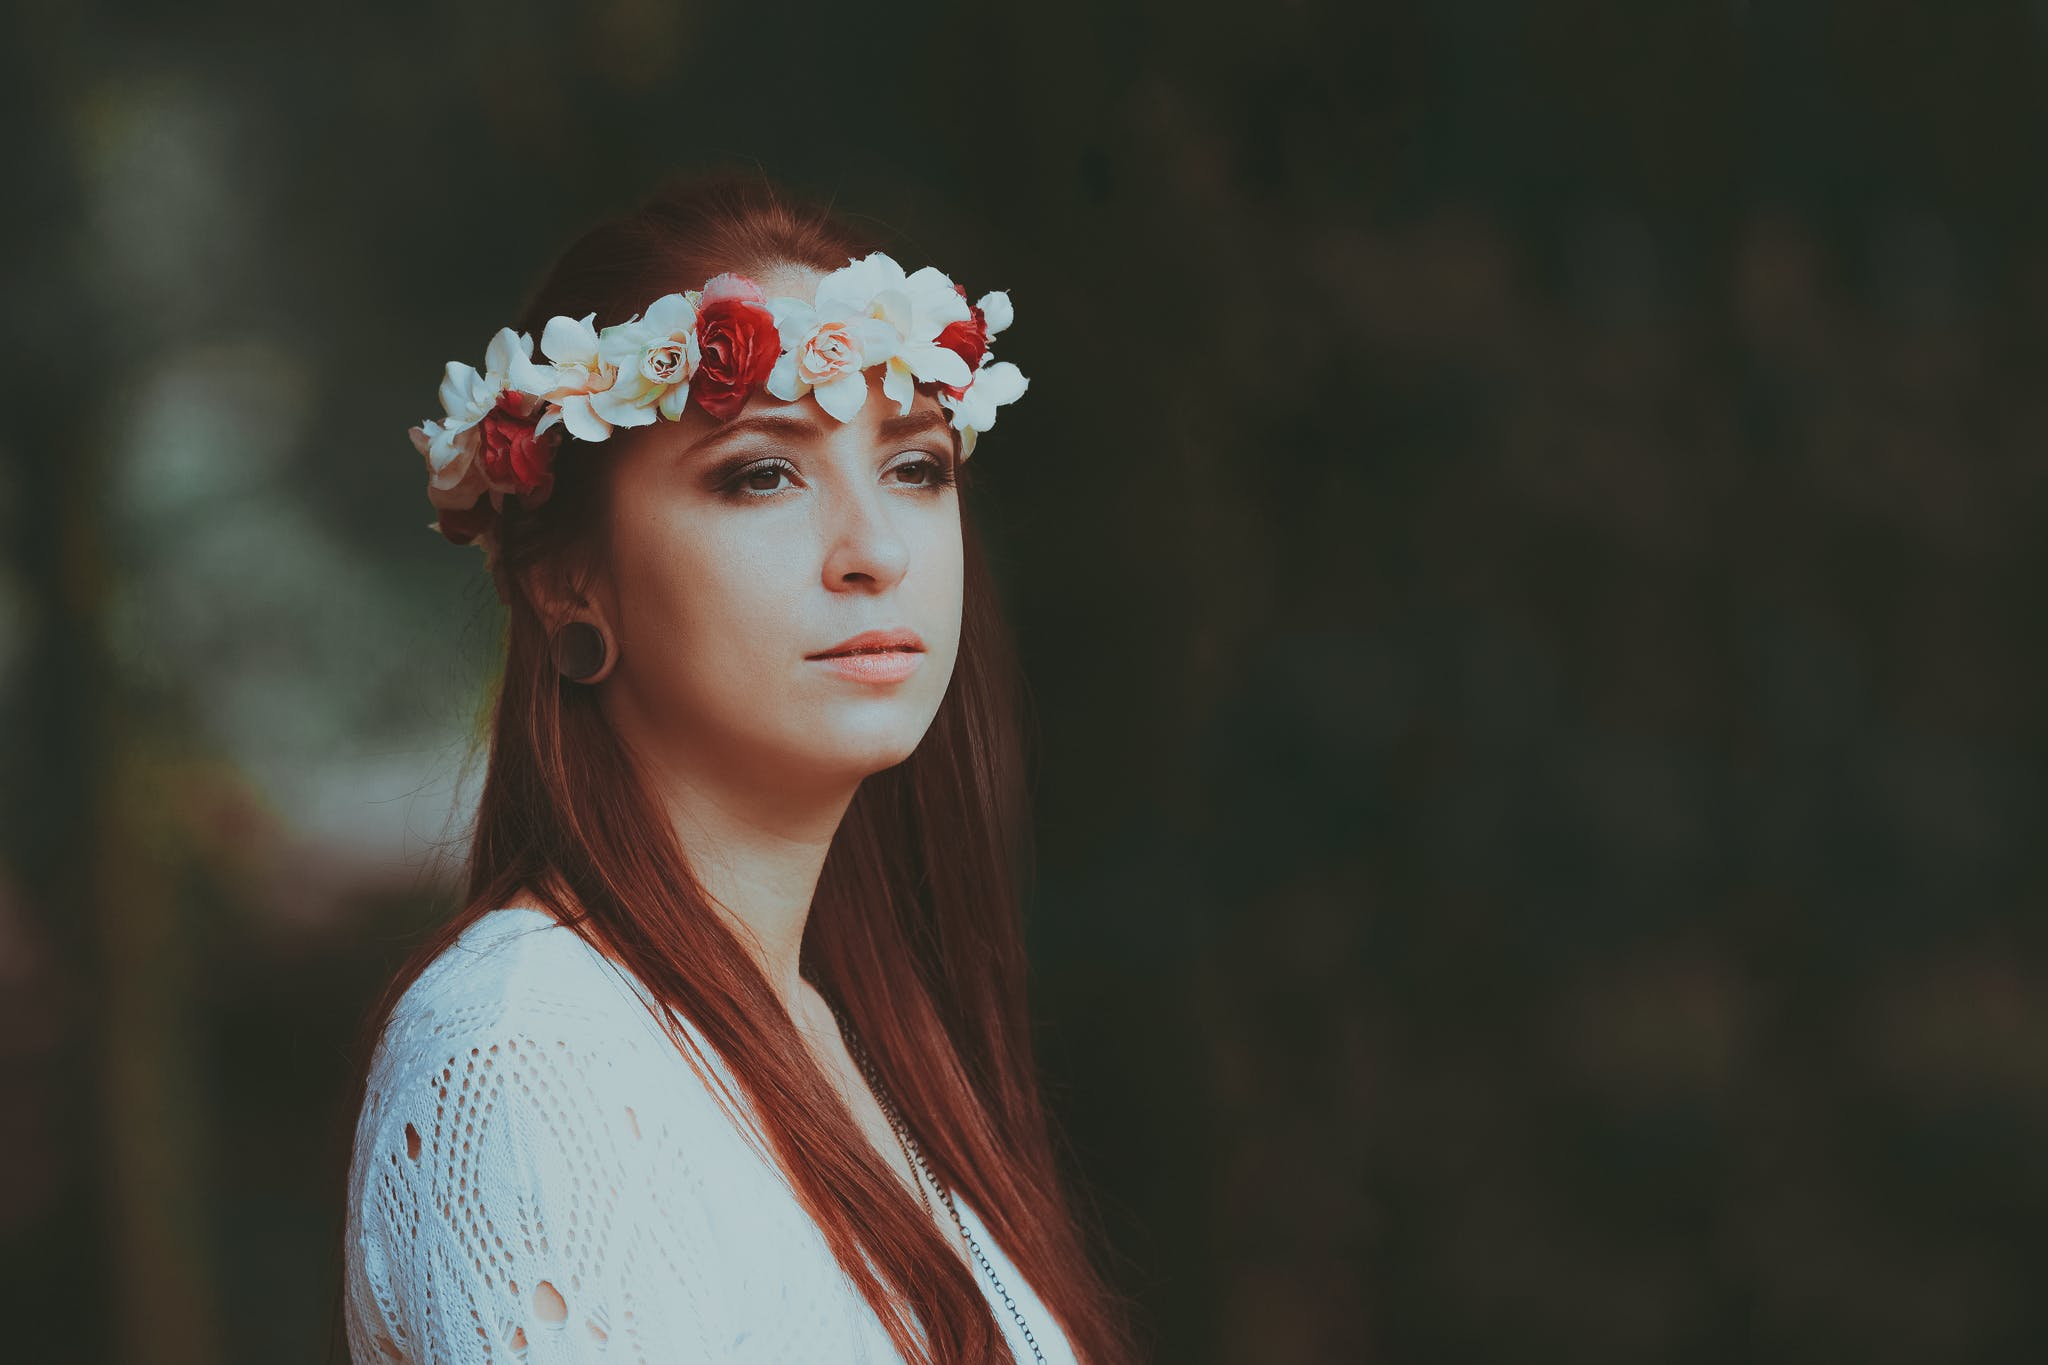 Macro Shot of Woman Standing Outdoors